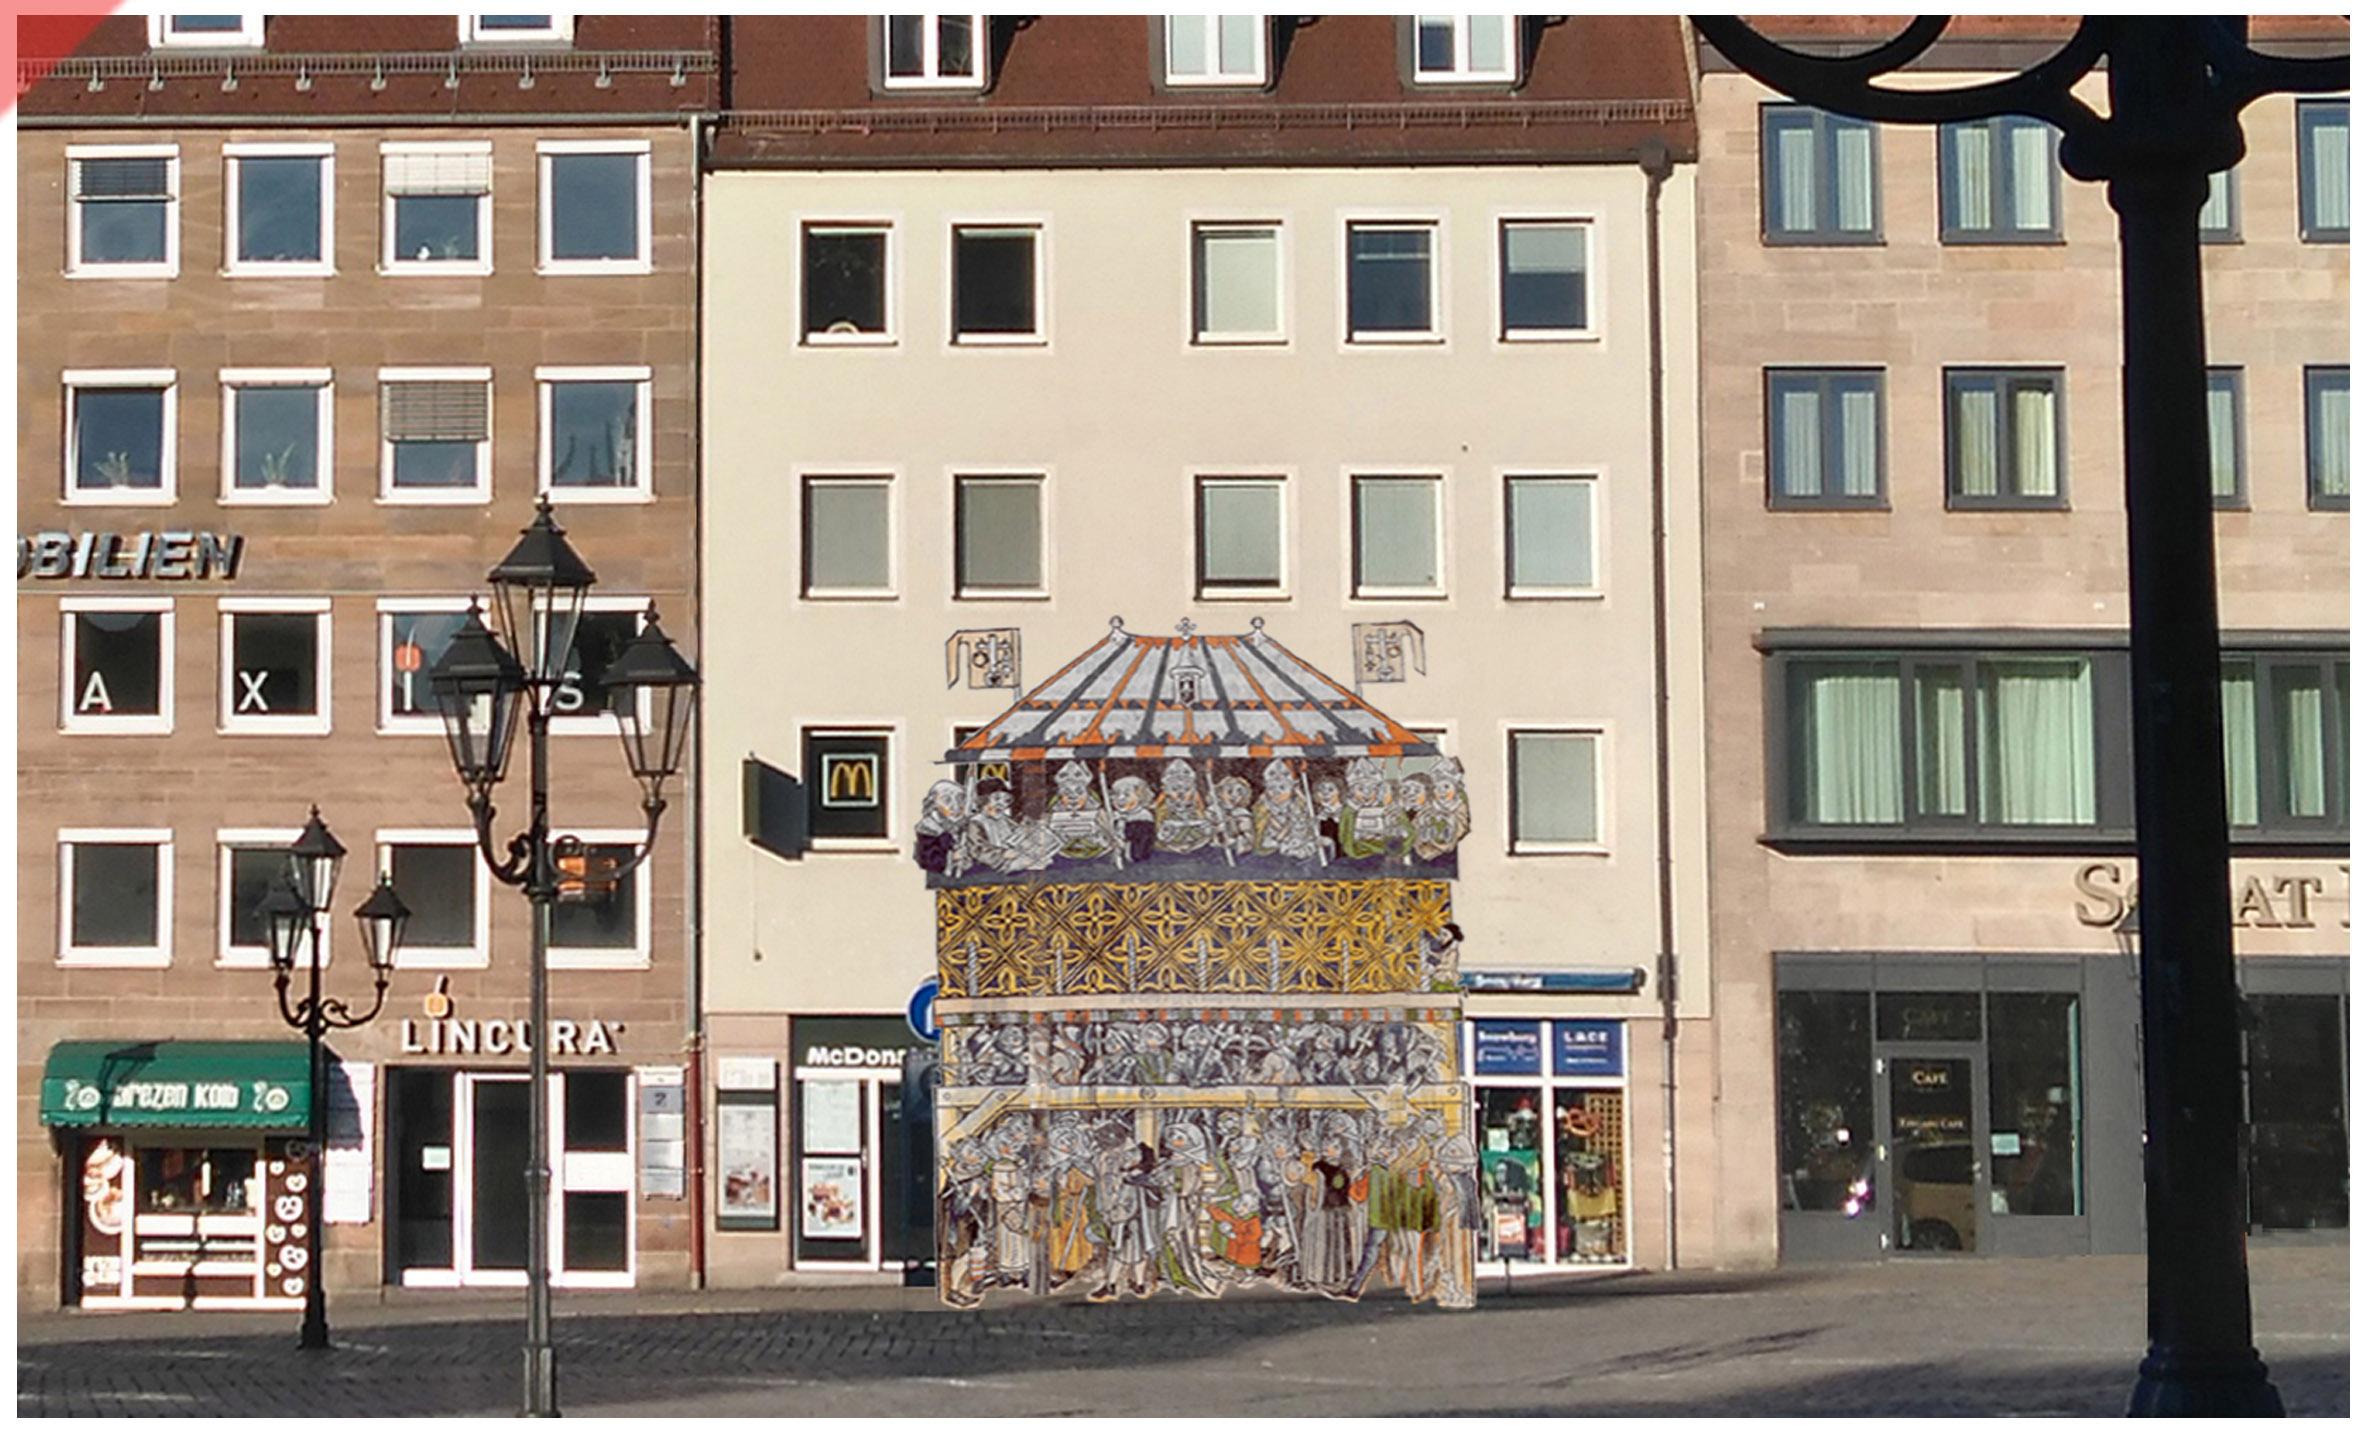 Heiltumsweisung-Nürnberg-Hauptmarkt-15-Schopper-Behaim-1424-1523-Rekonstruktion-Holzschnitt-1487-Gebäude-3-Vergleich